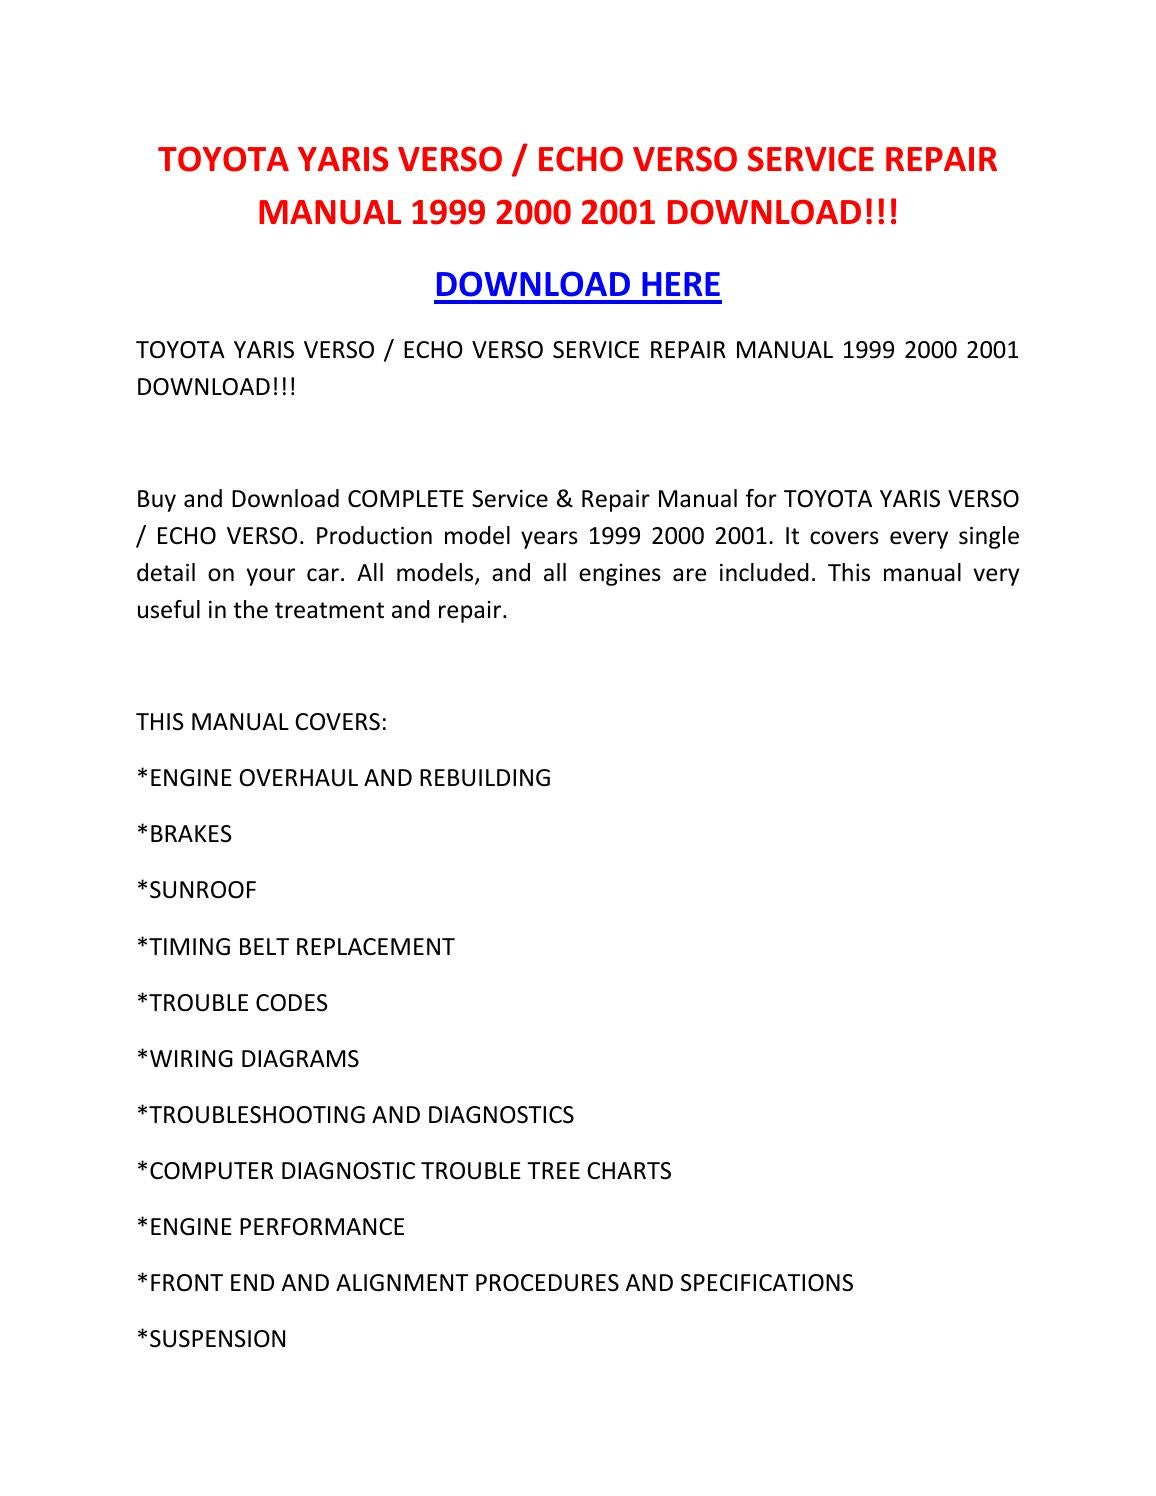 Toyota Yaris Verso Echo Verso Service Repair Manual 1999